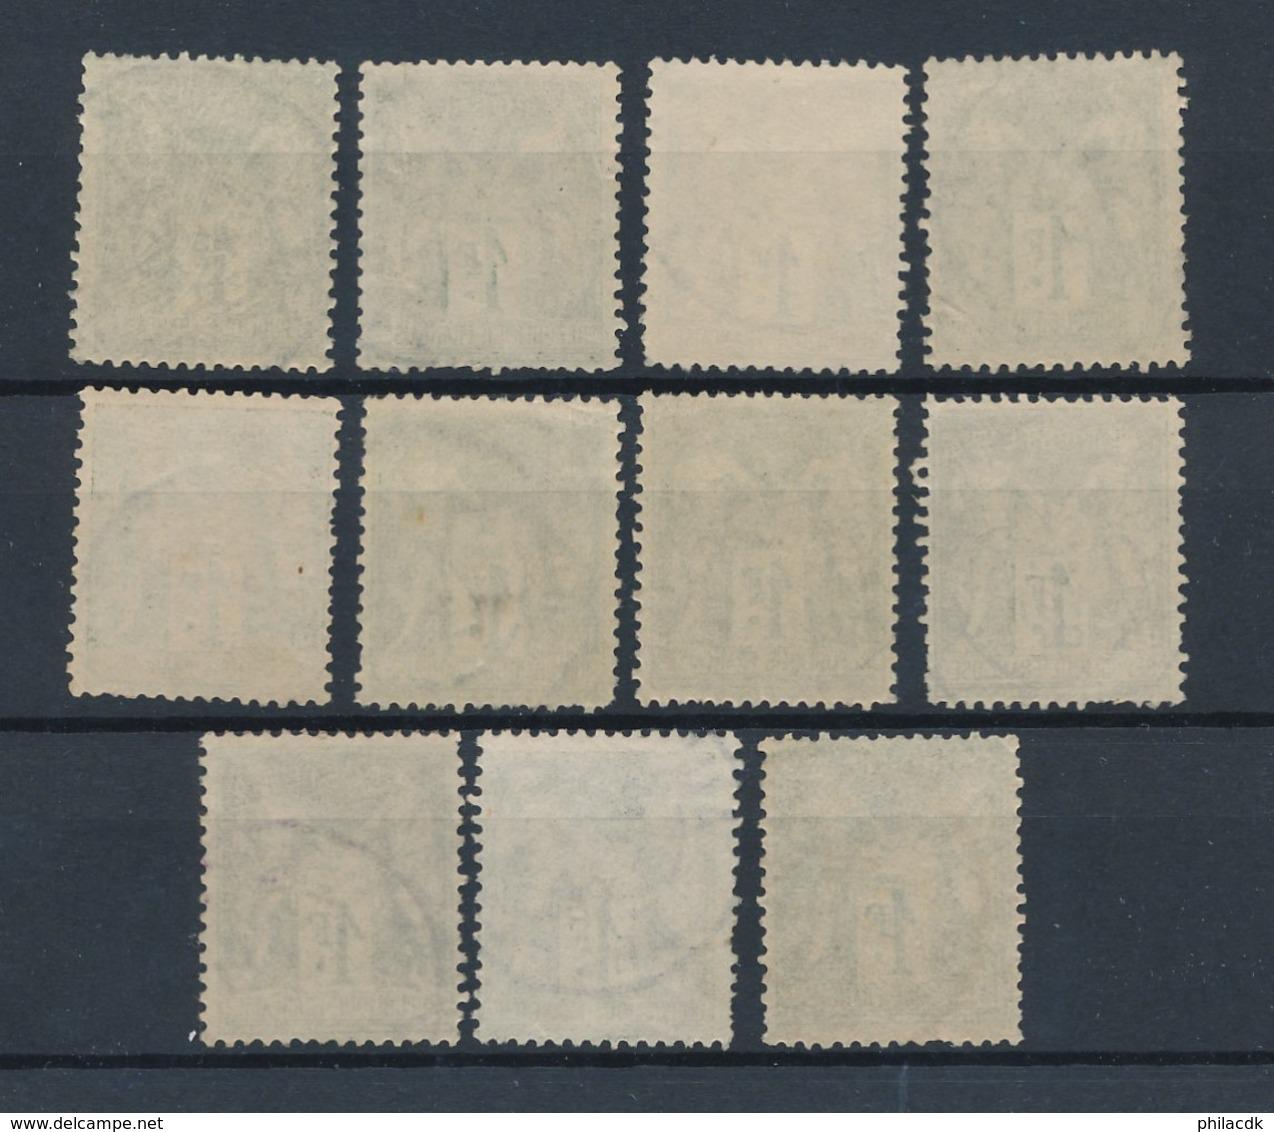 FRANCE - BELLE COLLECTION DE 519 TIMBRES MAJORITE TYPE SAGE OBLITERES POUR ETUDE - VOIR SCANNS RECTO VERSO - Collections